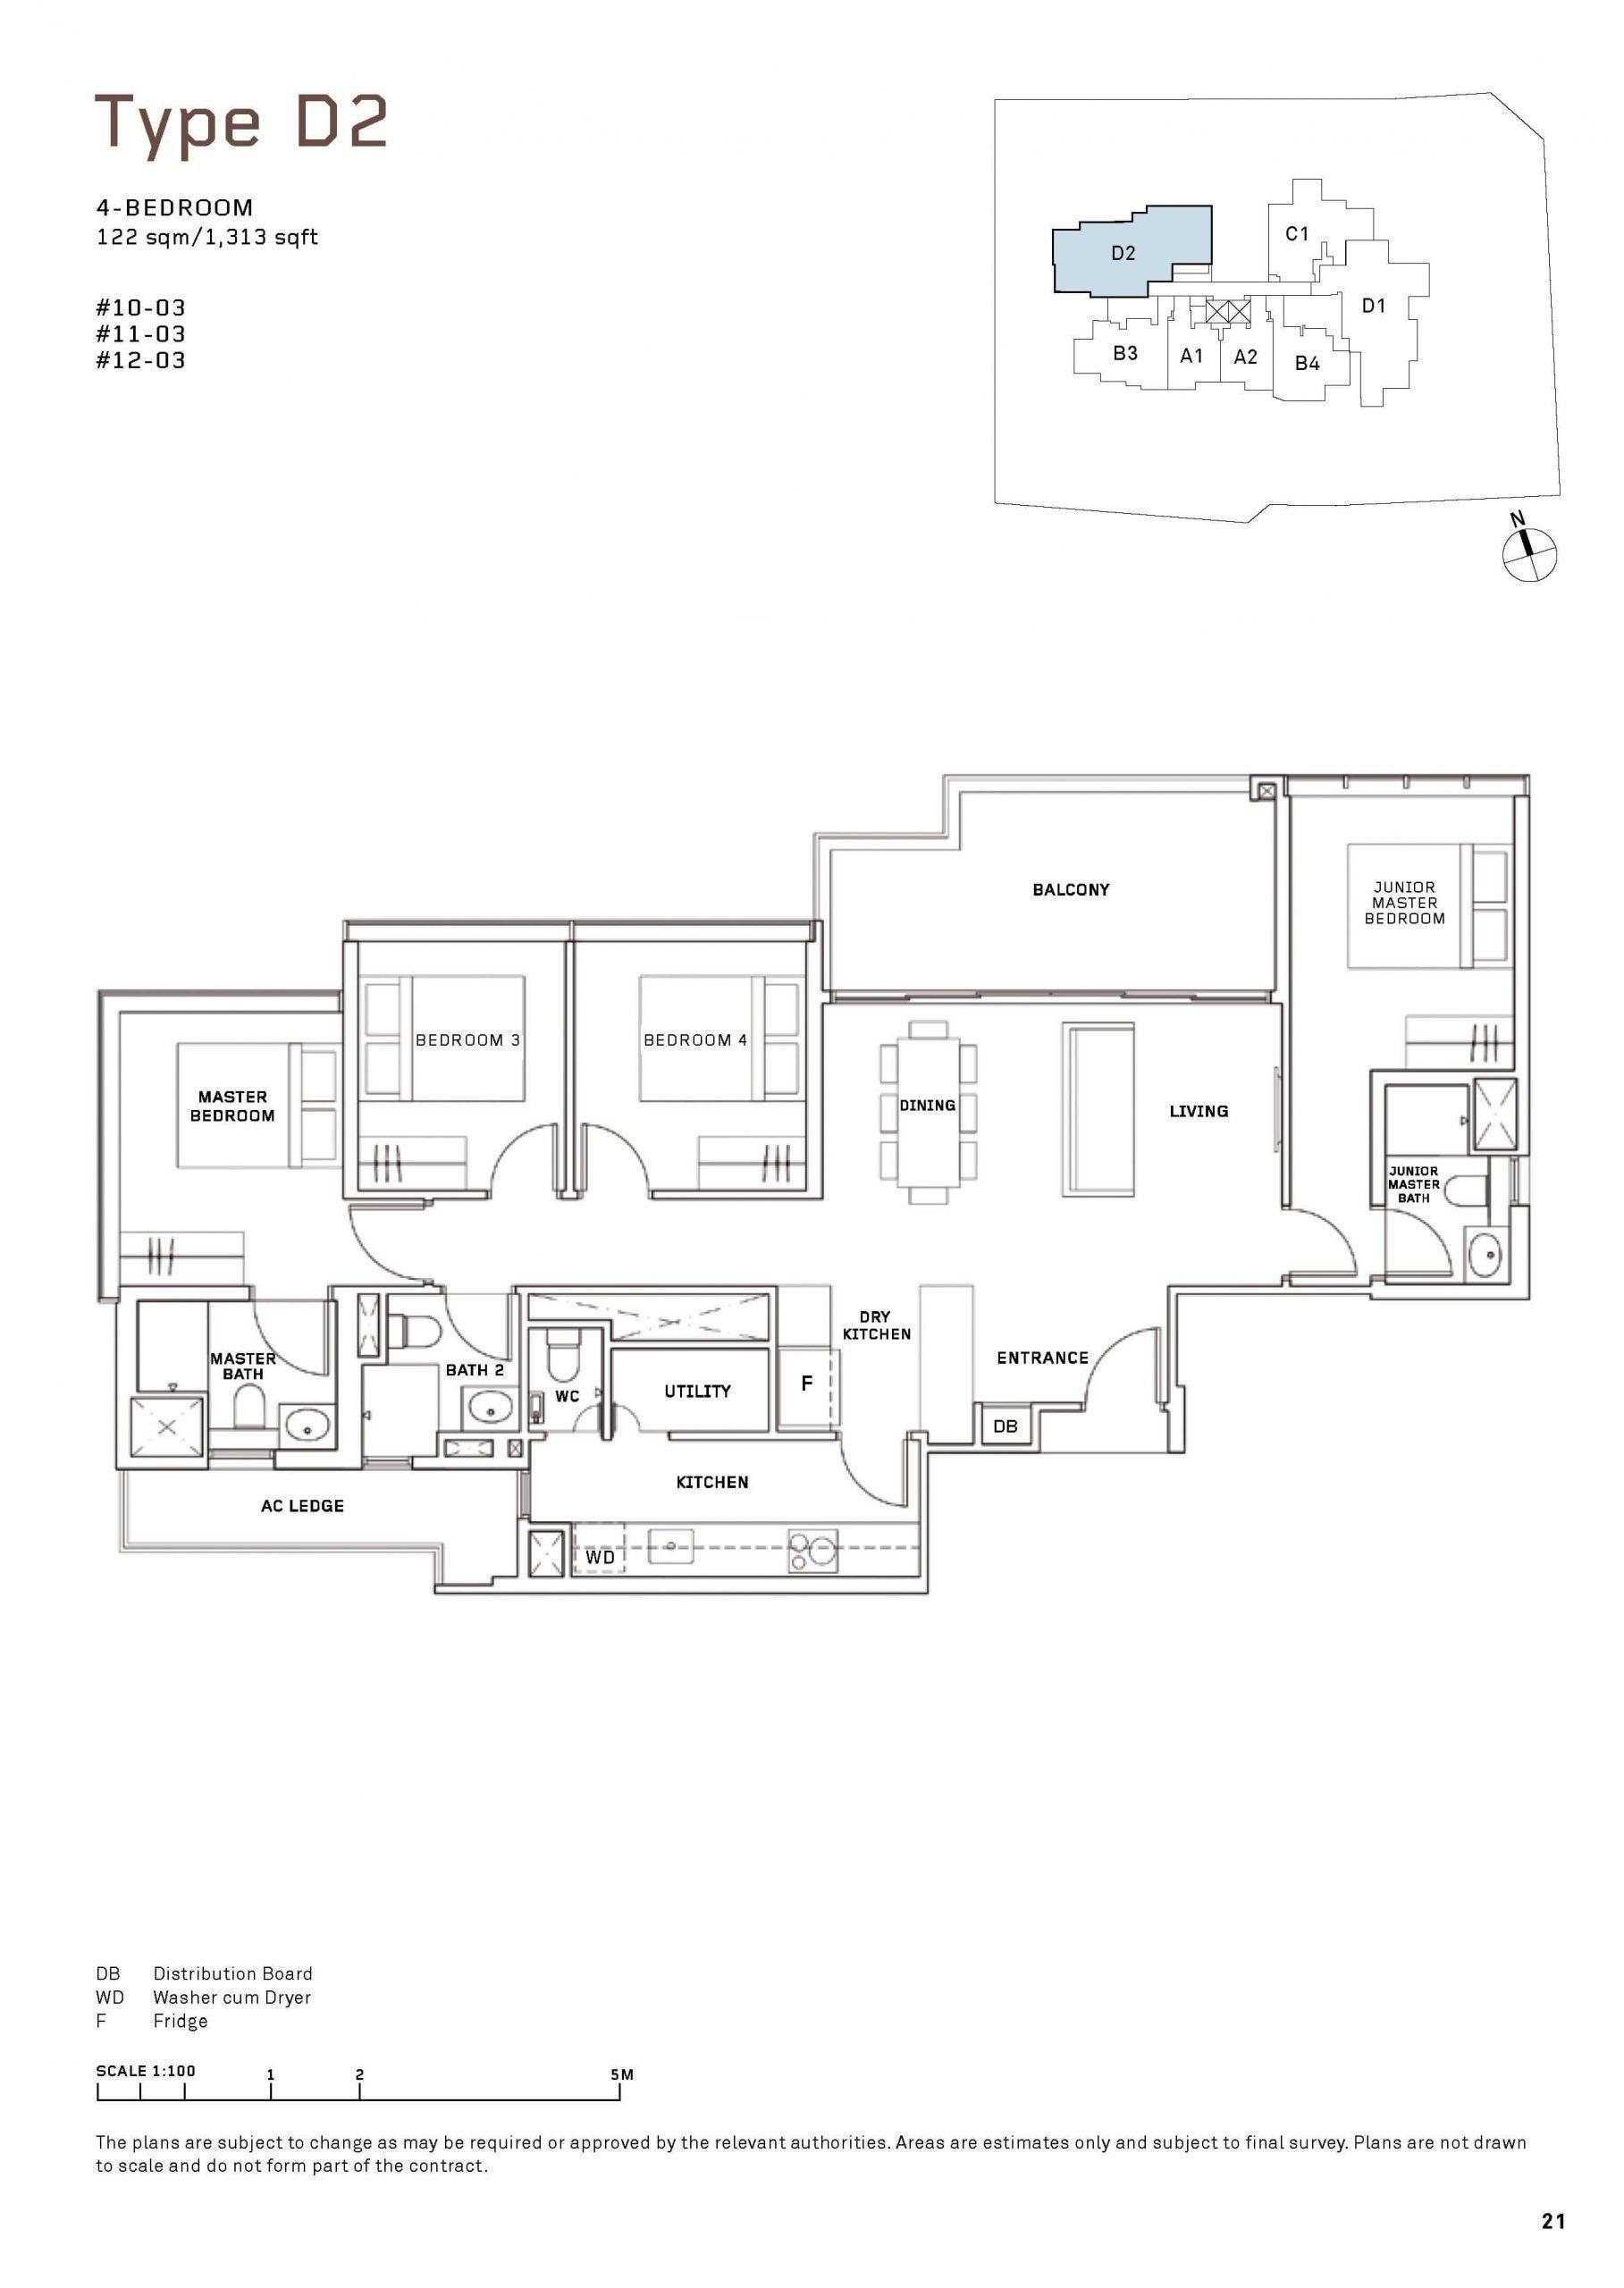 MYRA Condo Floor Plan 4 Bedroom 2 scaled